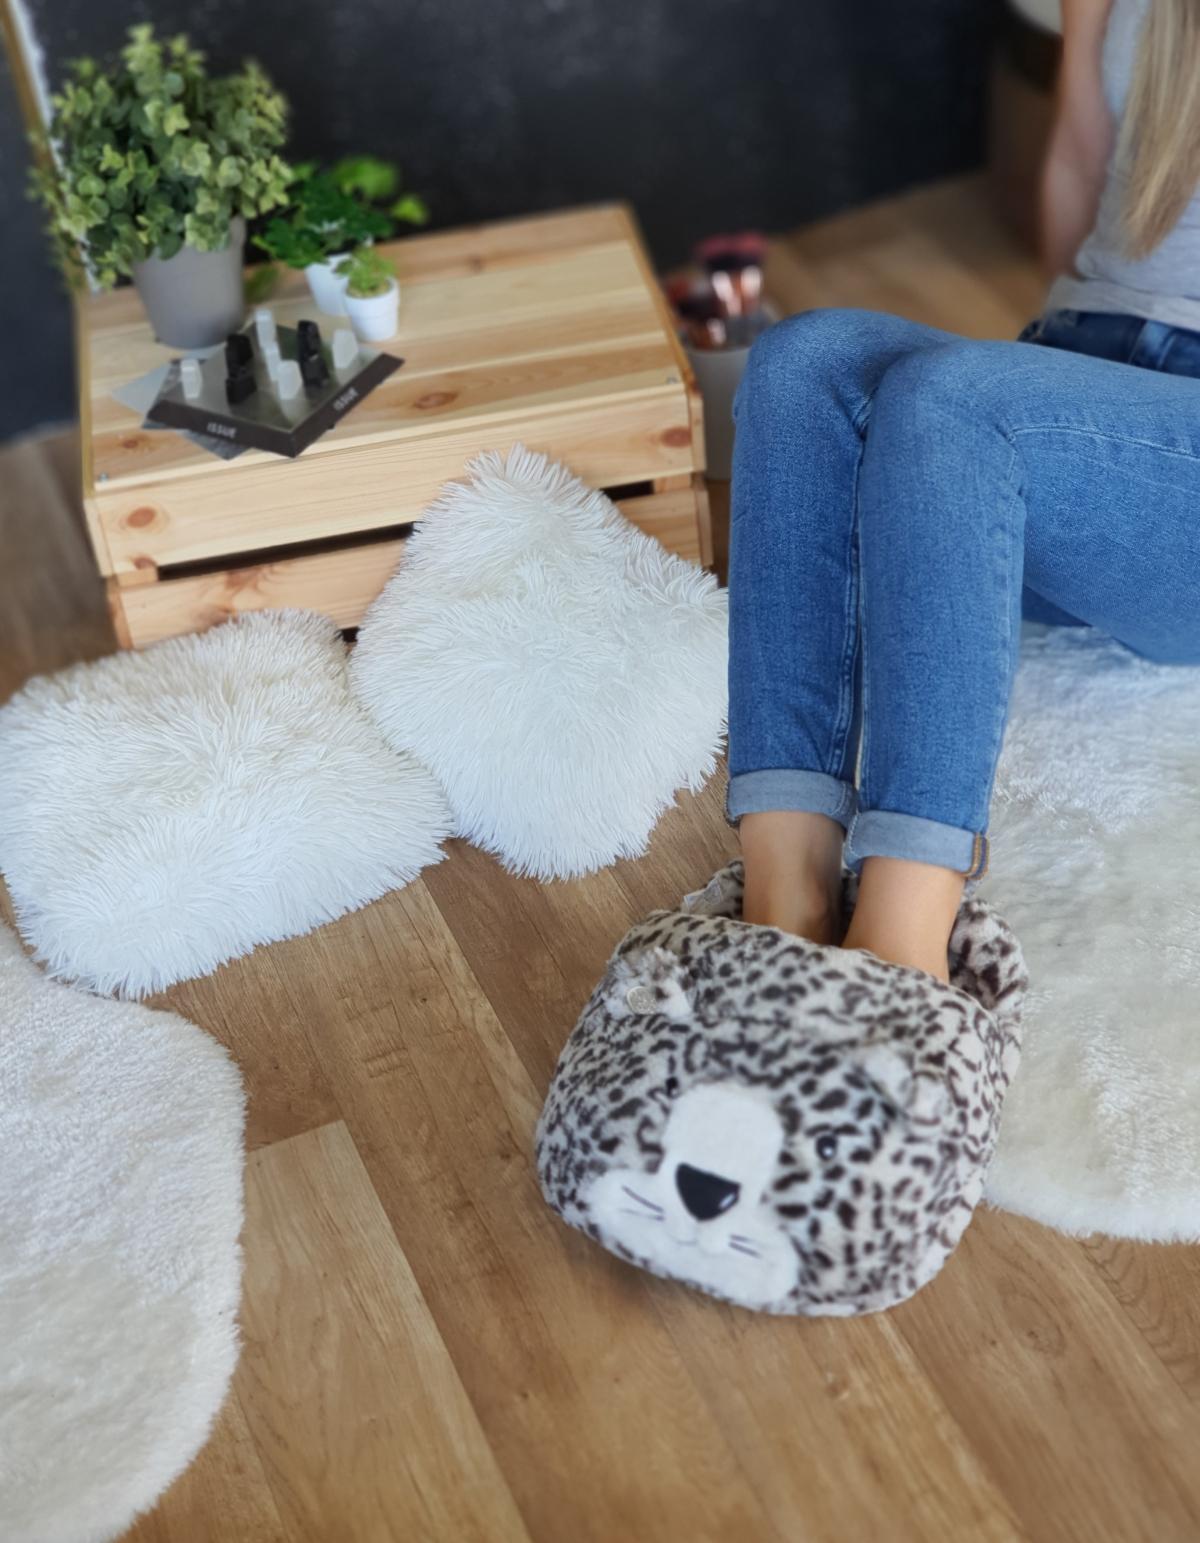 Oversized cozy παντόφλ τιγράκι - Λεοπάρ